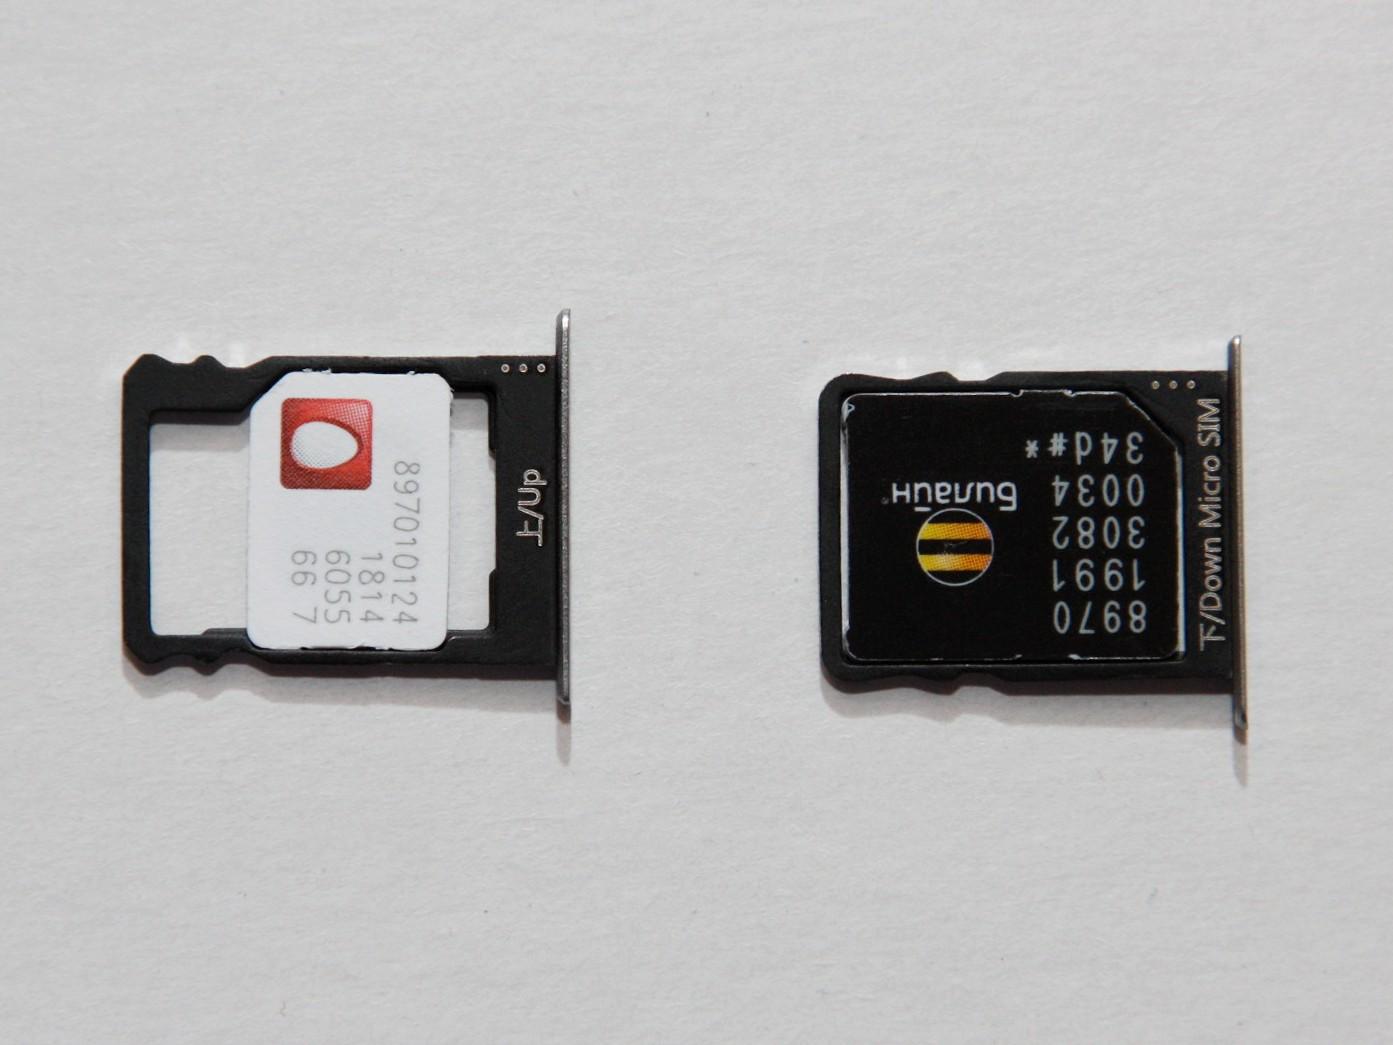 Huawei P8 Lite - SIM-card 1